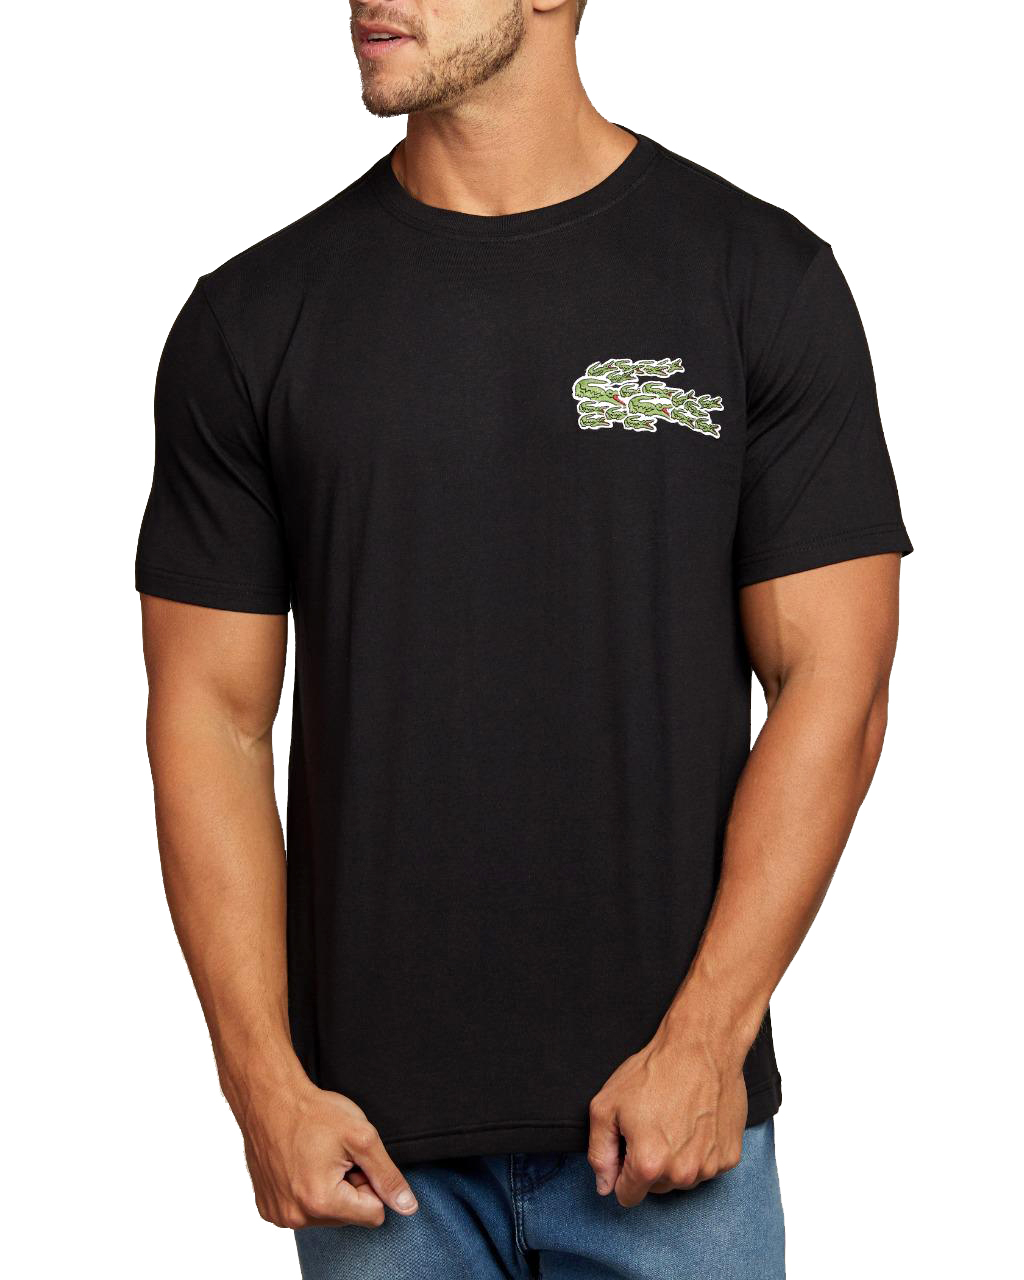 Camiseta Lacoste Live Masculina Croc Patch Classic Cotton Preto